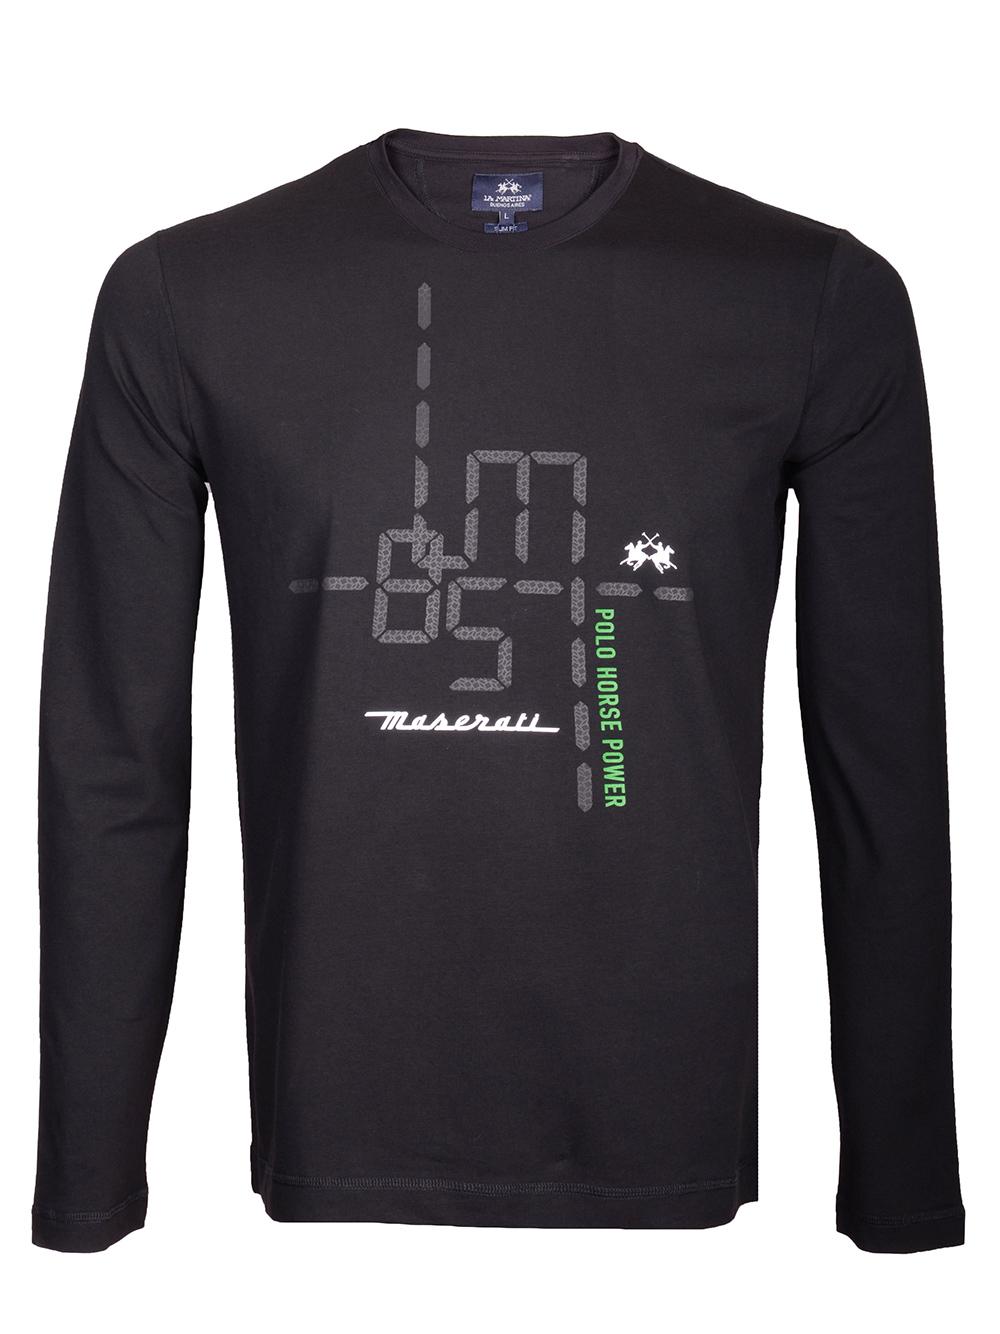 LA MARTINA Μπλούζα T-Shirt 3LM0MRM02-9999 ΜΑΥΡΟ